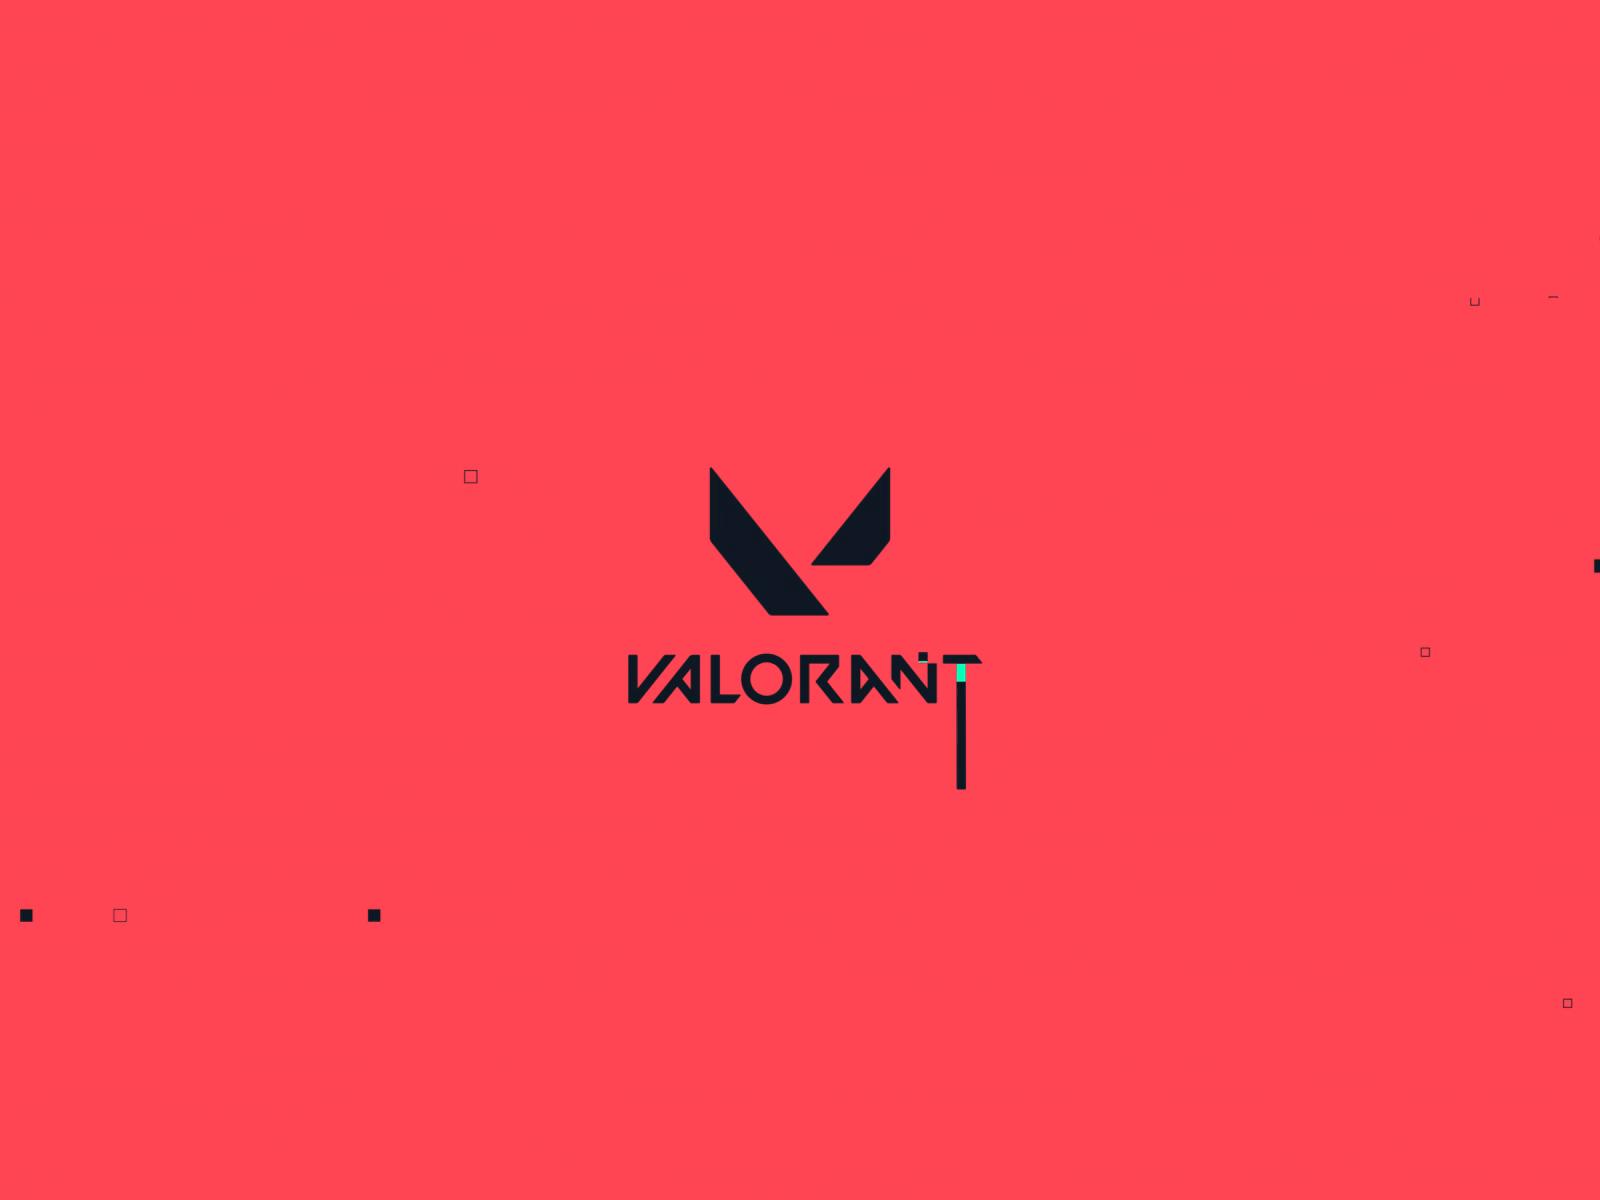 Valorant Logo Animation By Nicolas Girard Animation Logos Animation Design